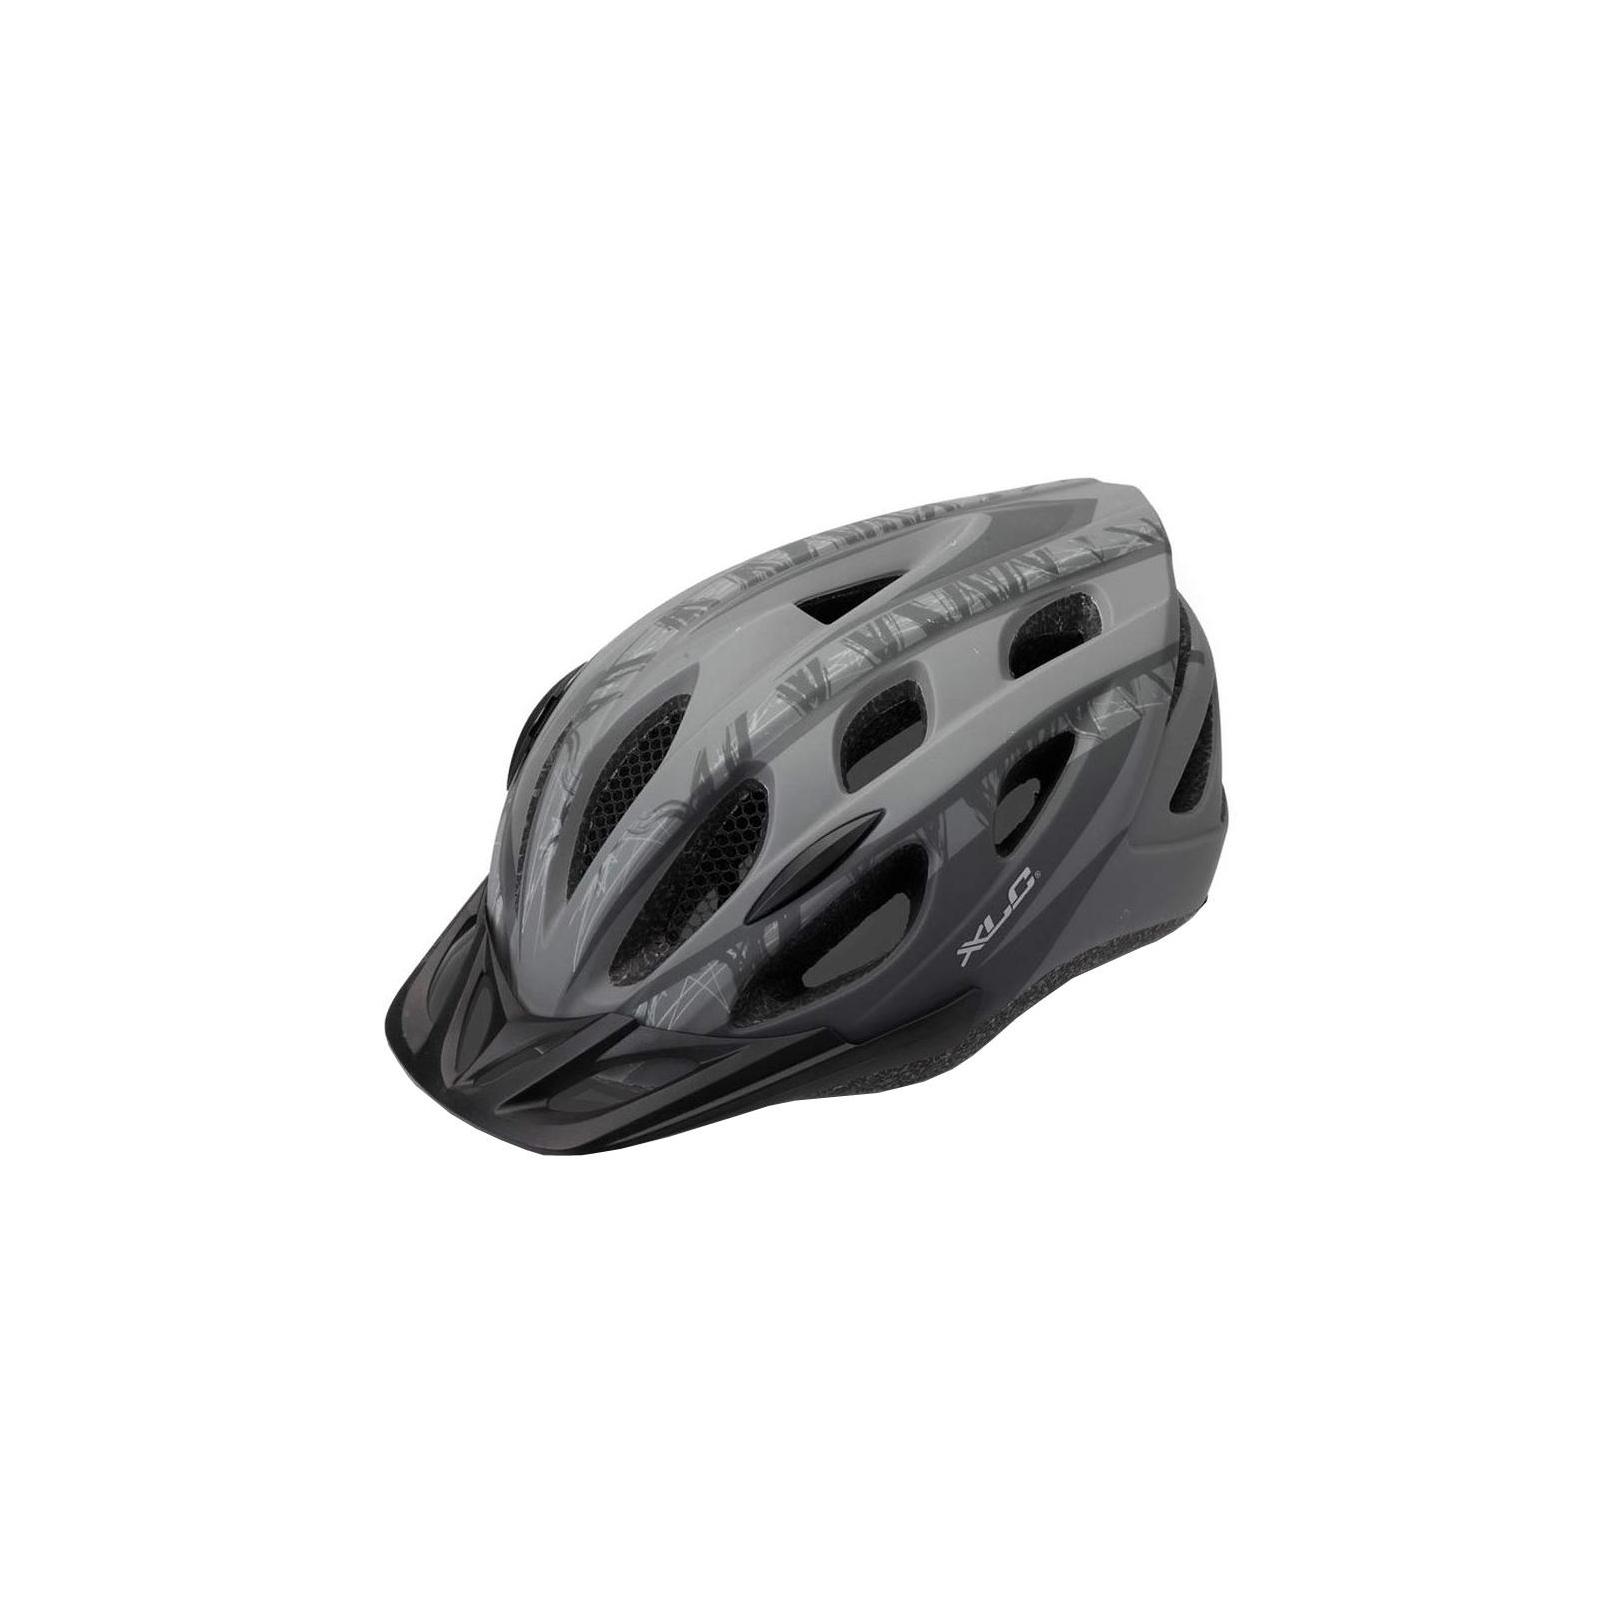 Шлем XLC BH-C19, черно-серый, S/M (51-56) (2500180060)